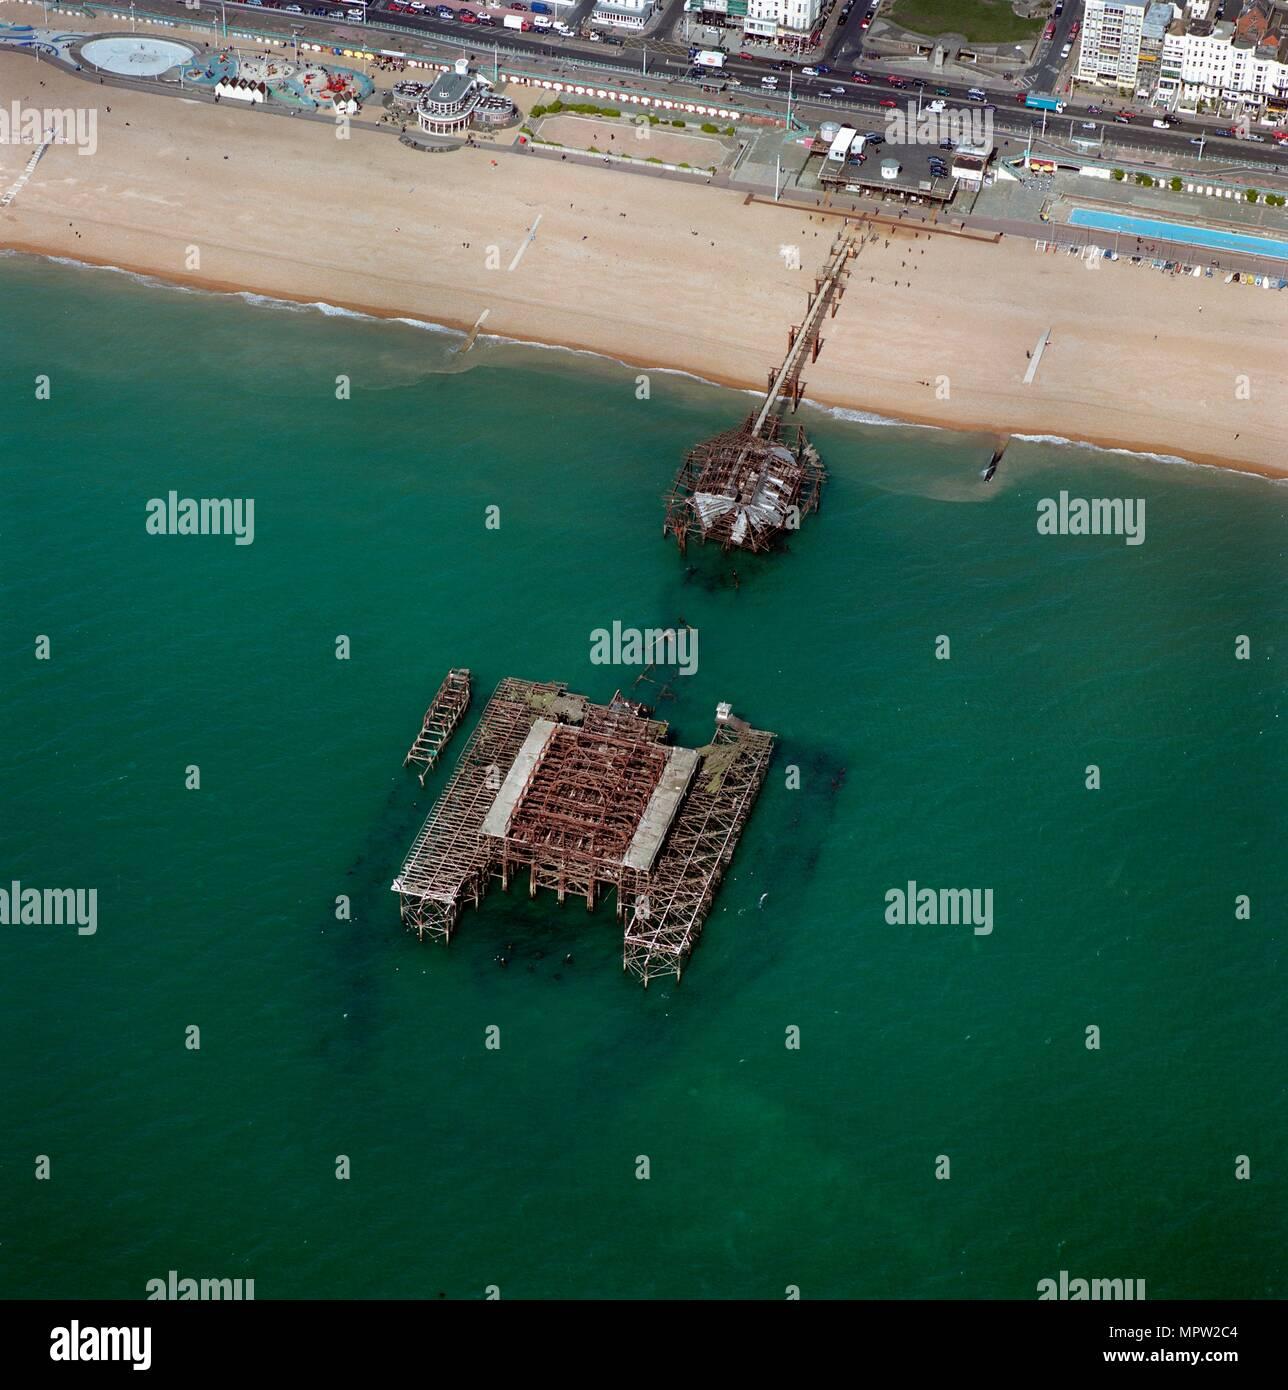 West Pier, Brighton, East Sussex. Artist: Damian Grady. Stock Photo